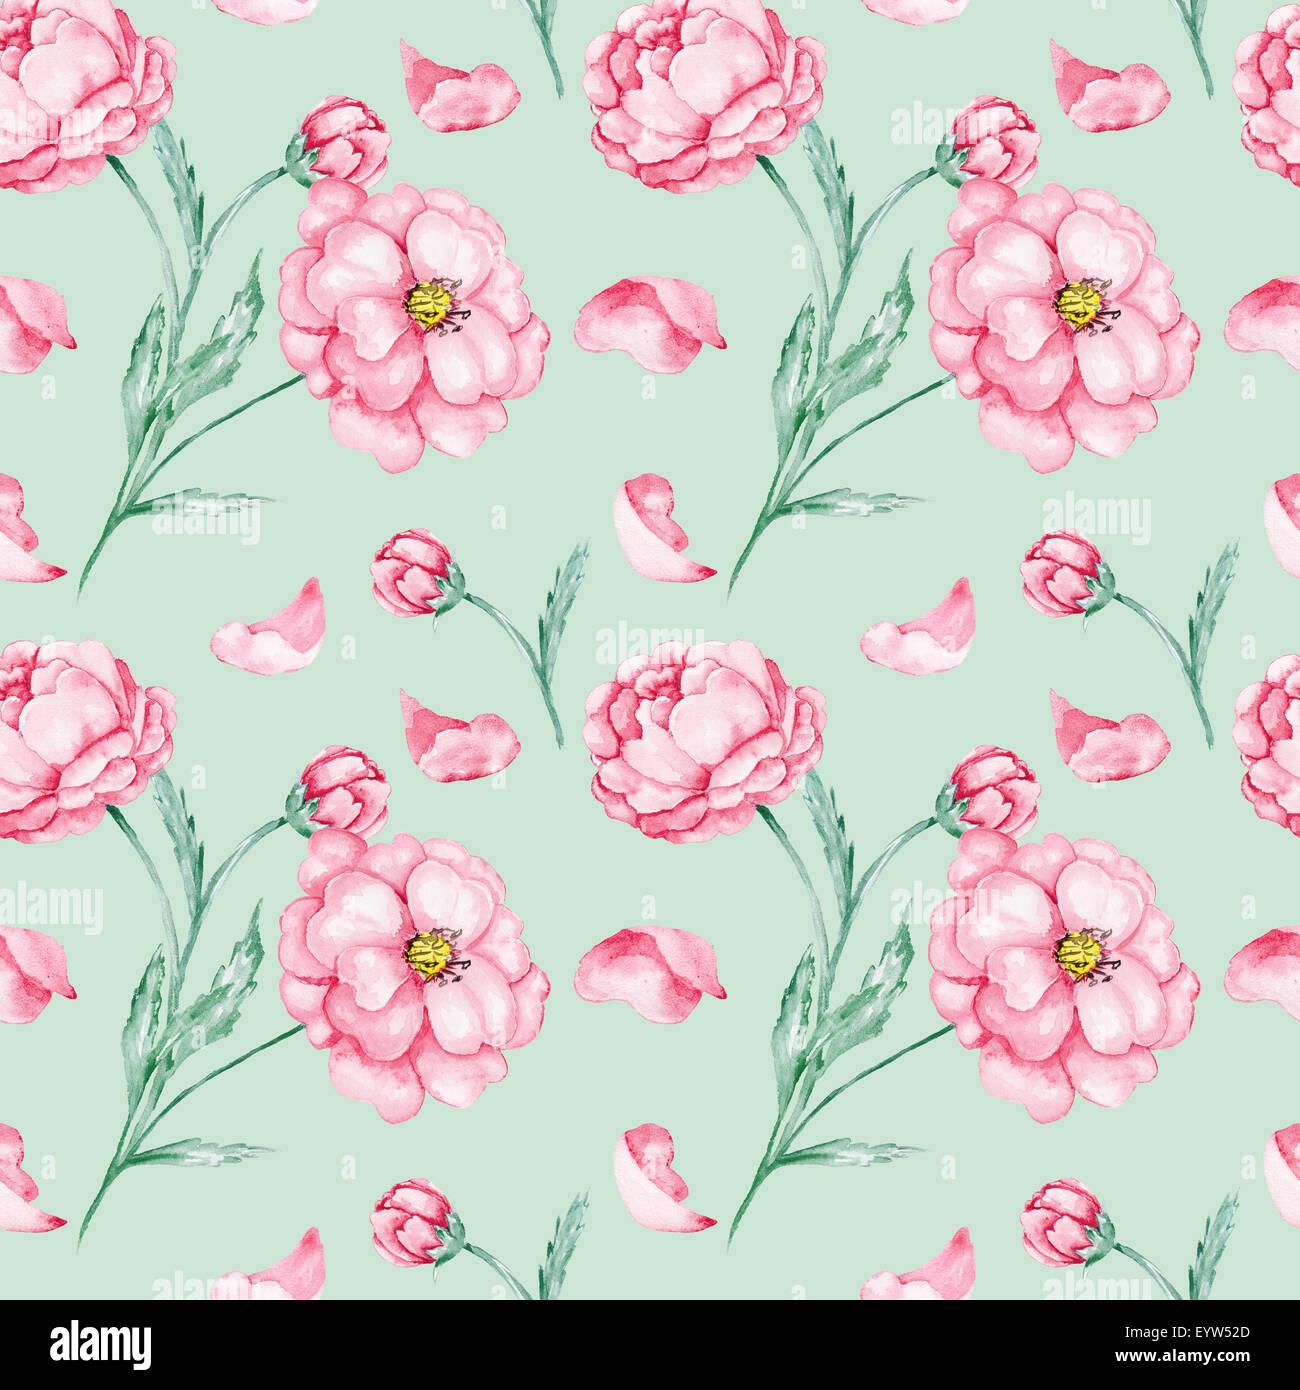 Vintage Light Green Floral Background For Textile And Wallpaper